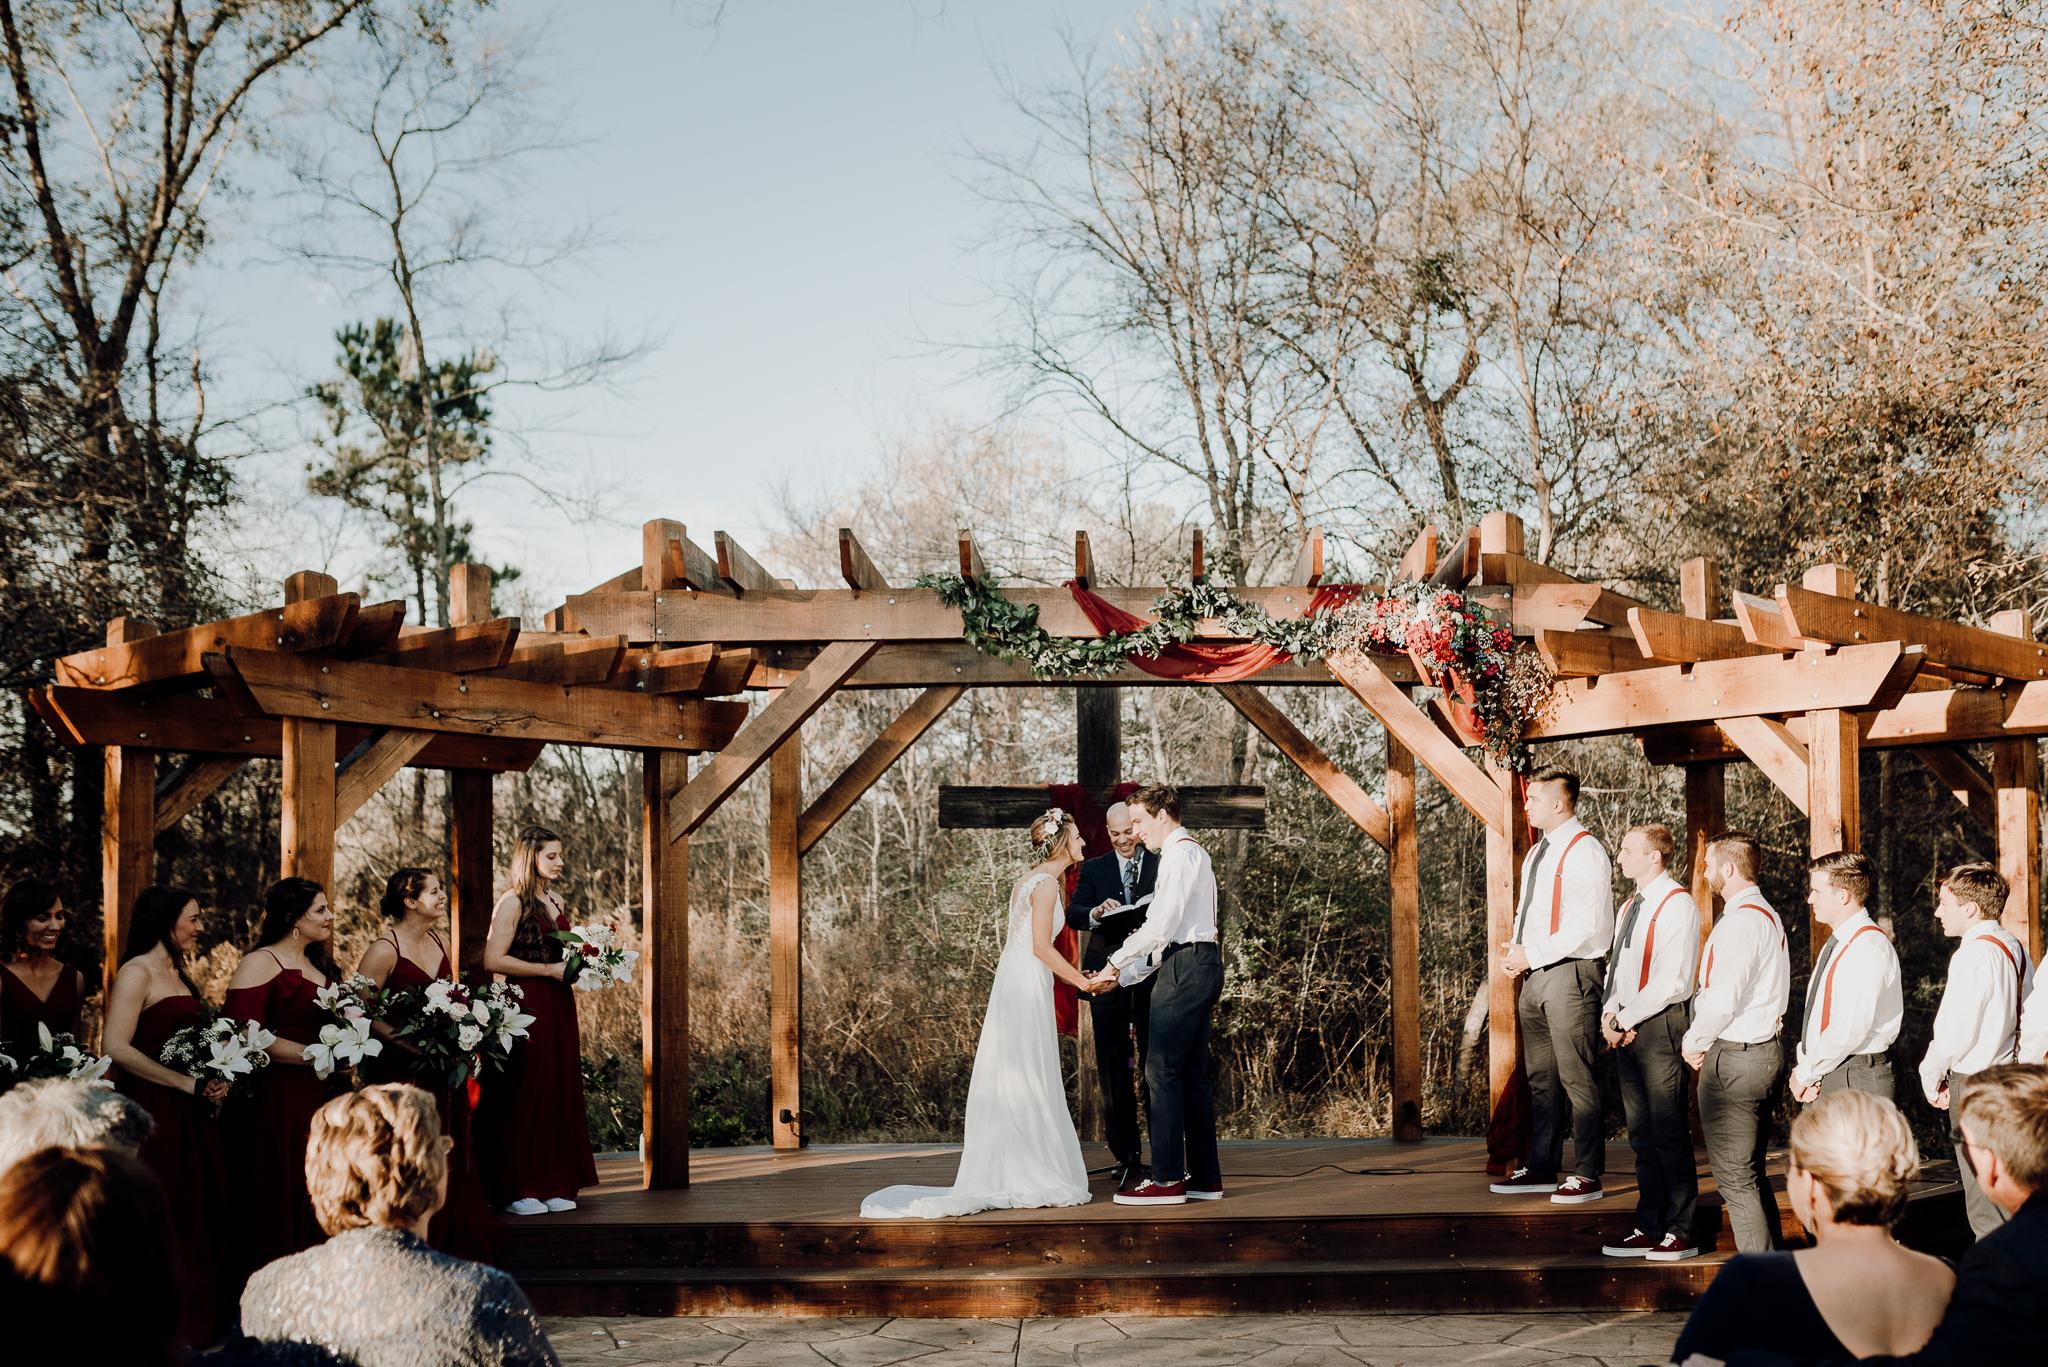 Michelle + Aron-Houston Wedding Photographer-Magnolia Meadows-Winter Wedding | Kristen Giles Photography - 043.jpg